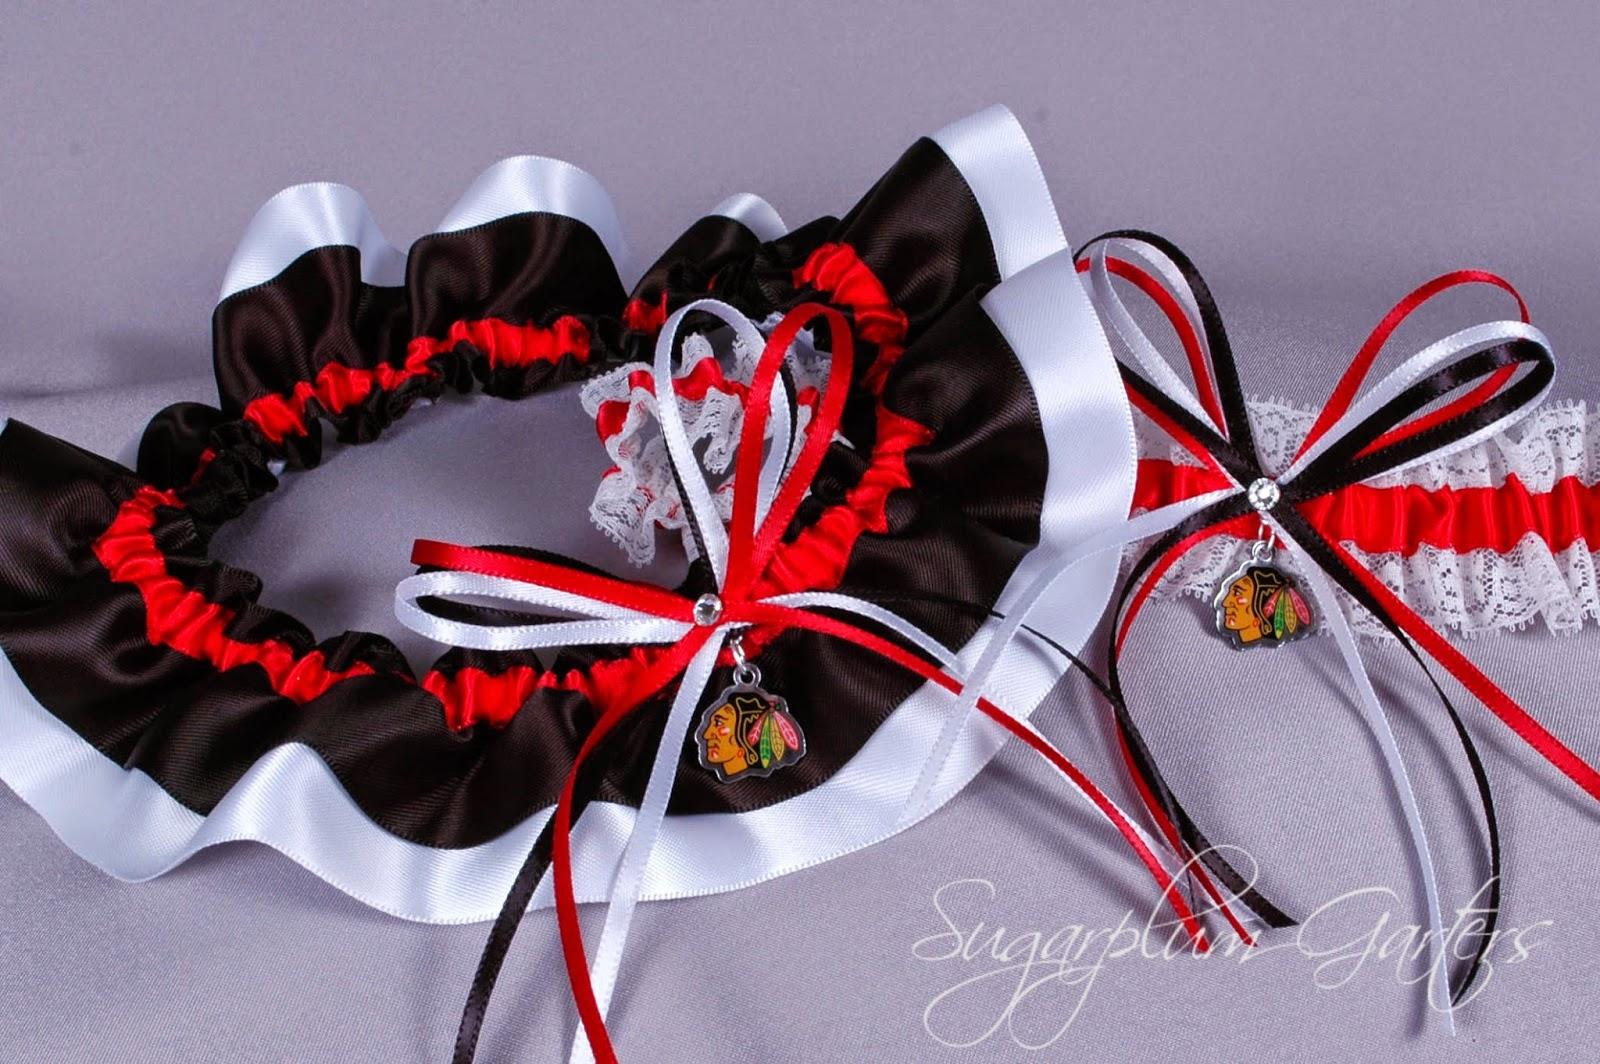 Custom Chicago Blackhawks Wedding Garter Set by Sugarplum Garters